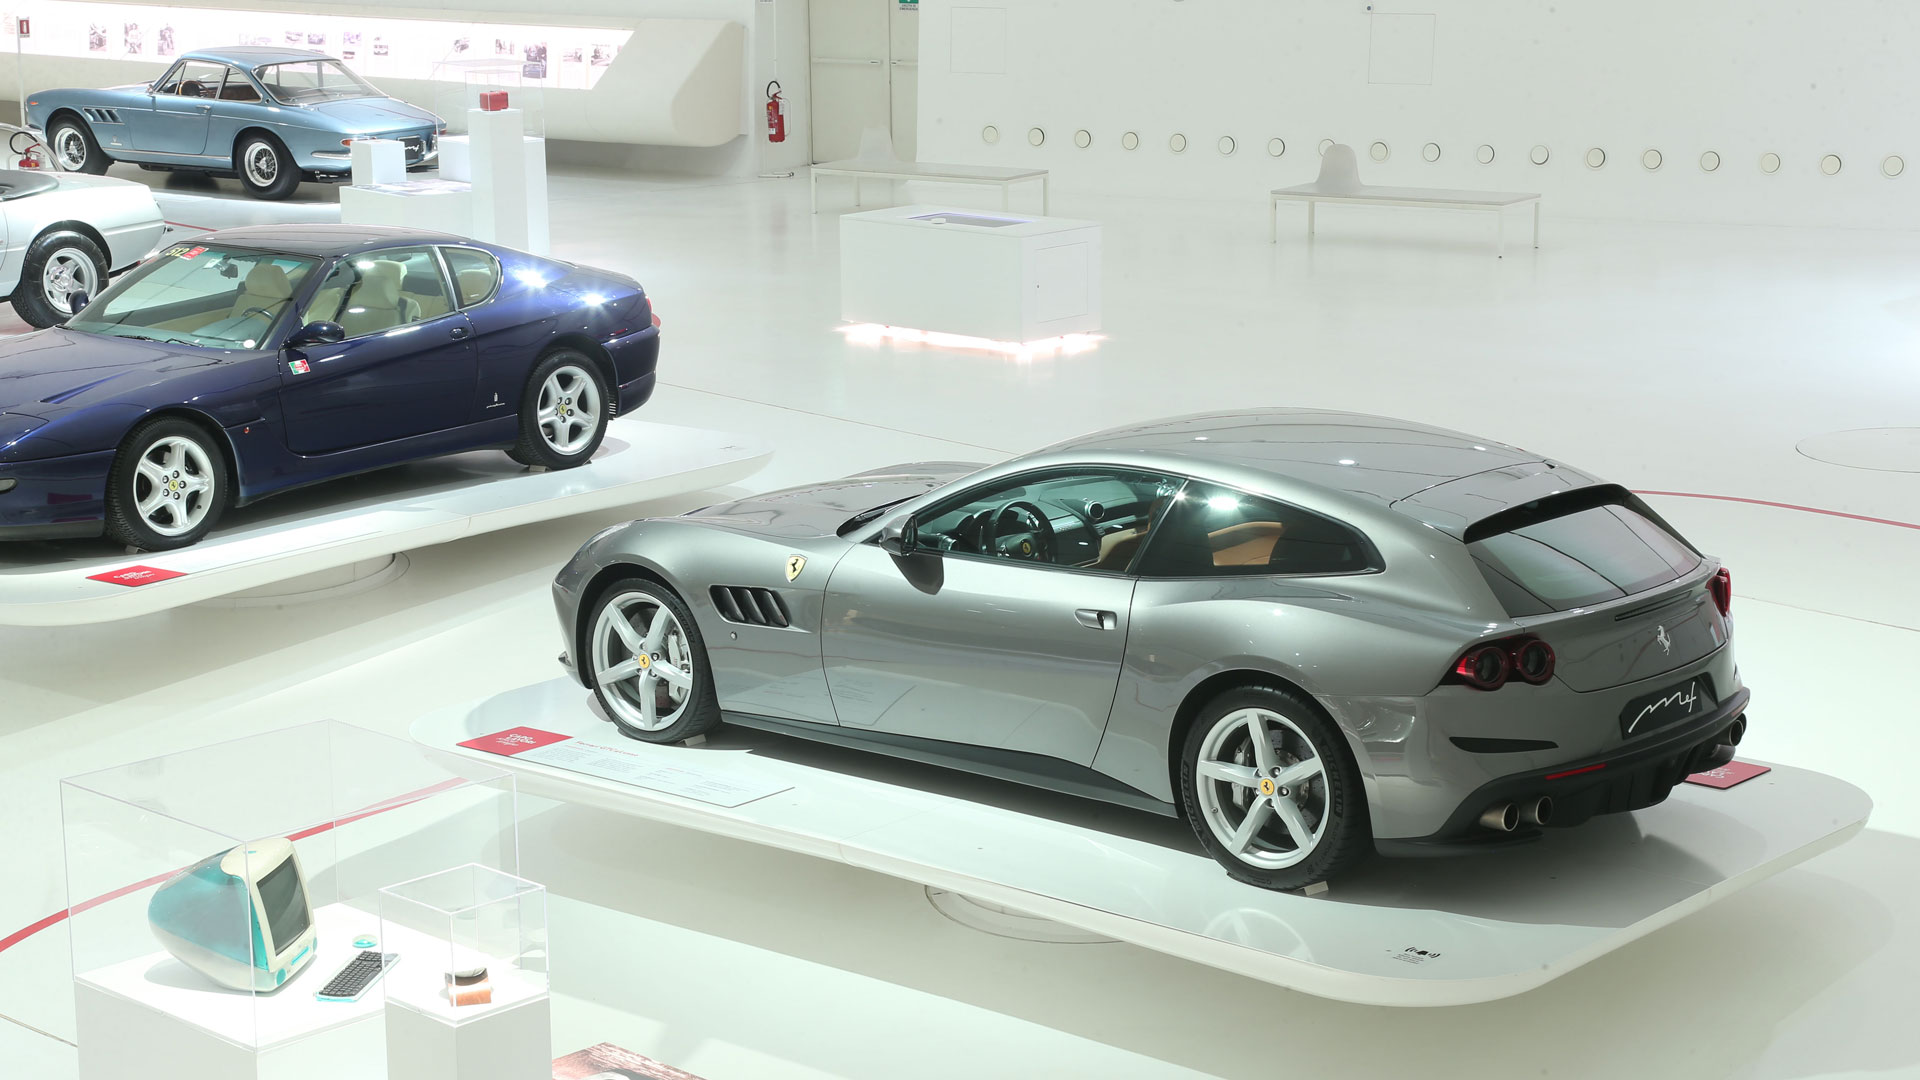 Ferrari GTC4Lusso at Museo Enzo Ferrari Modena